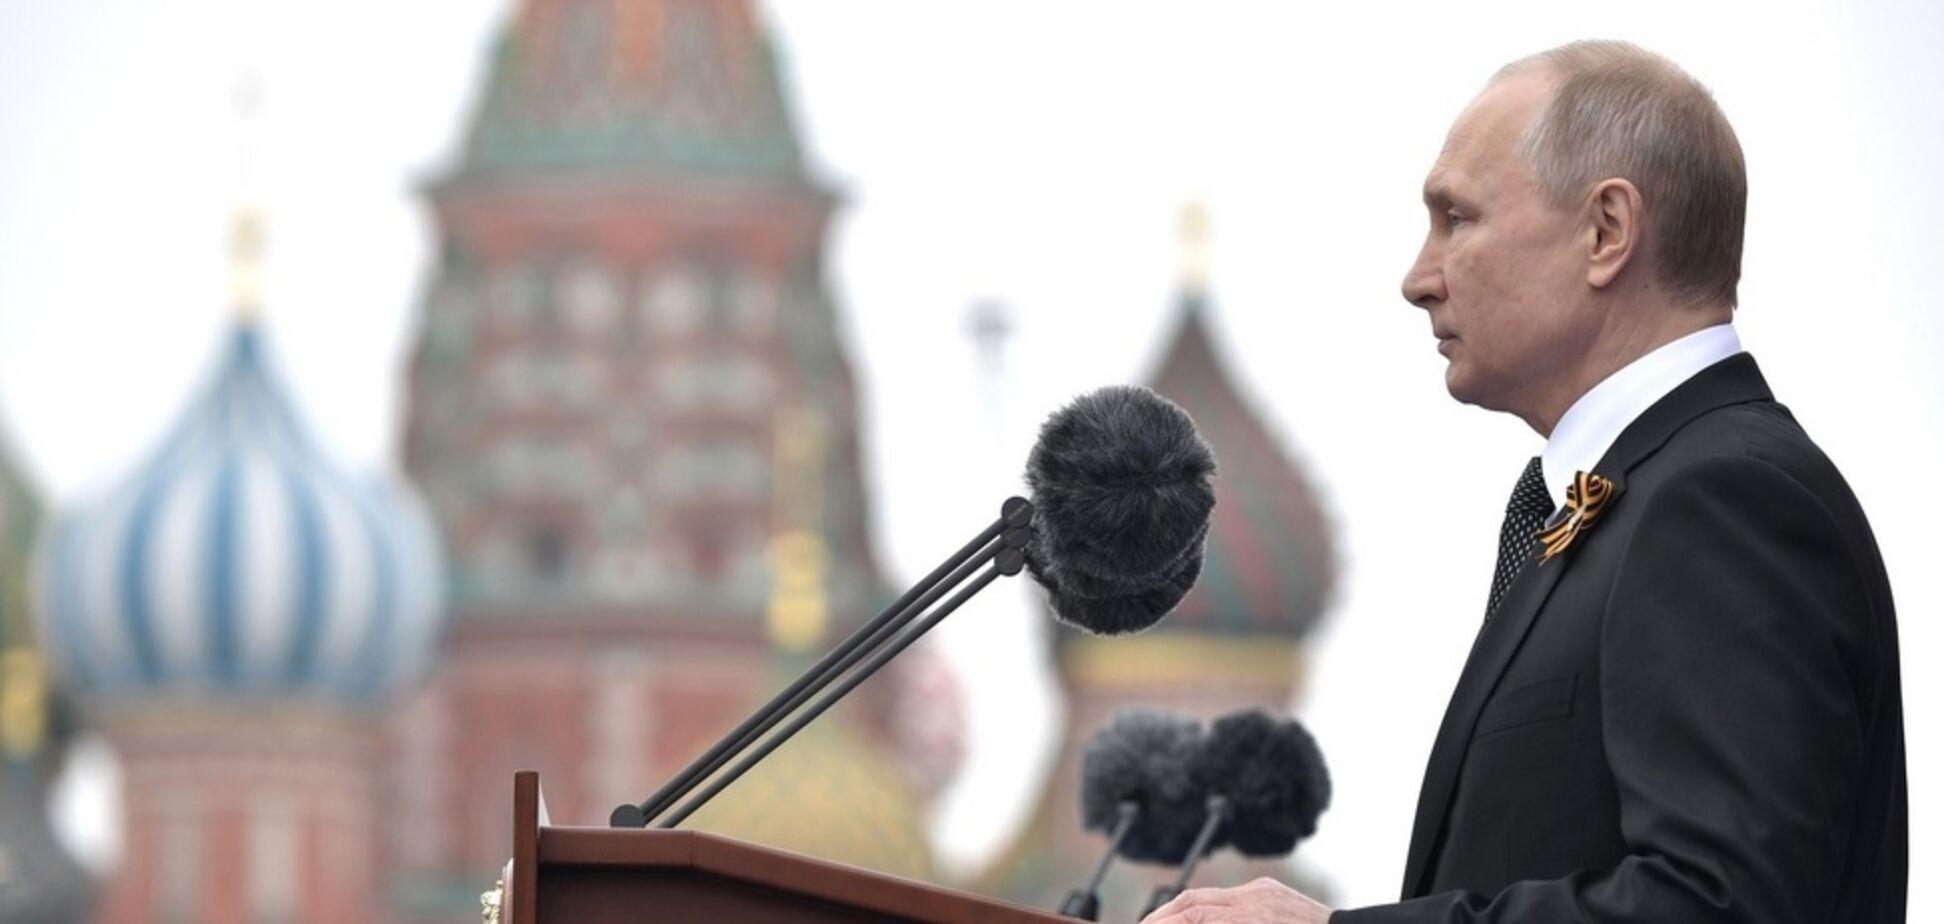 Когда уйдет Путин: Киселев назвал два условия